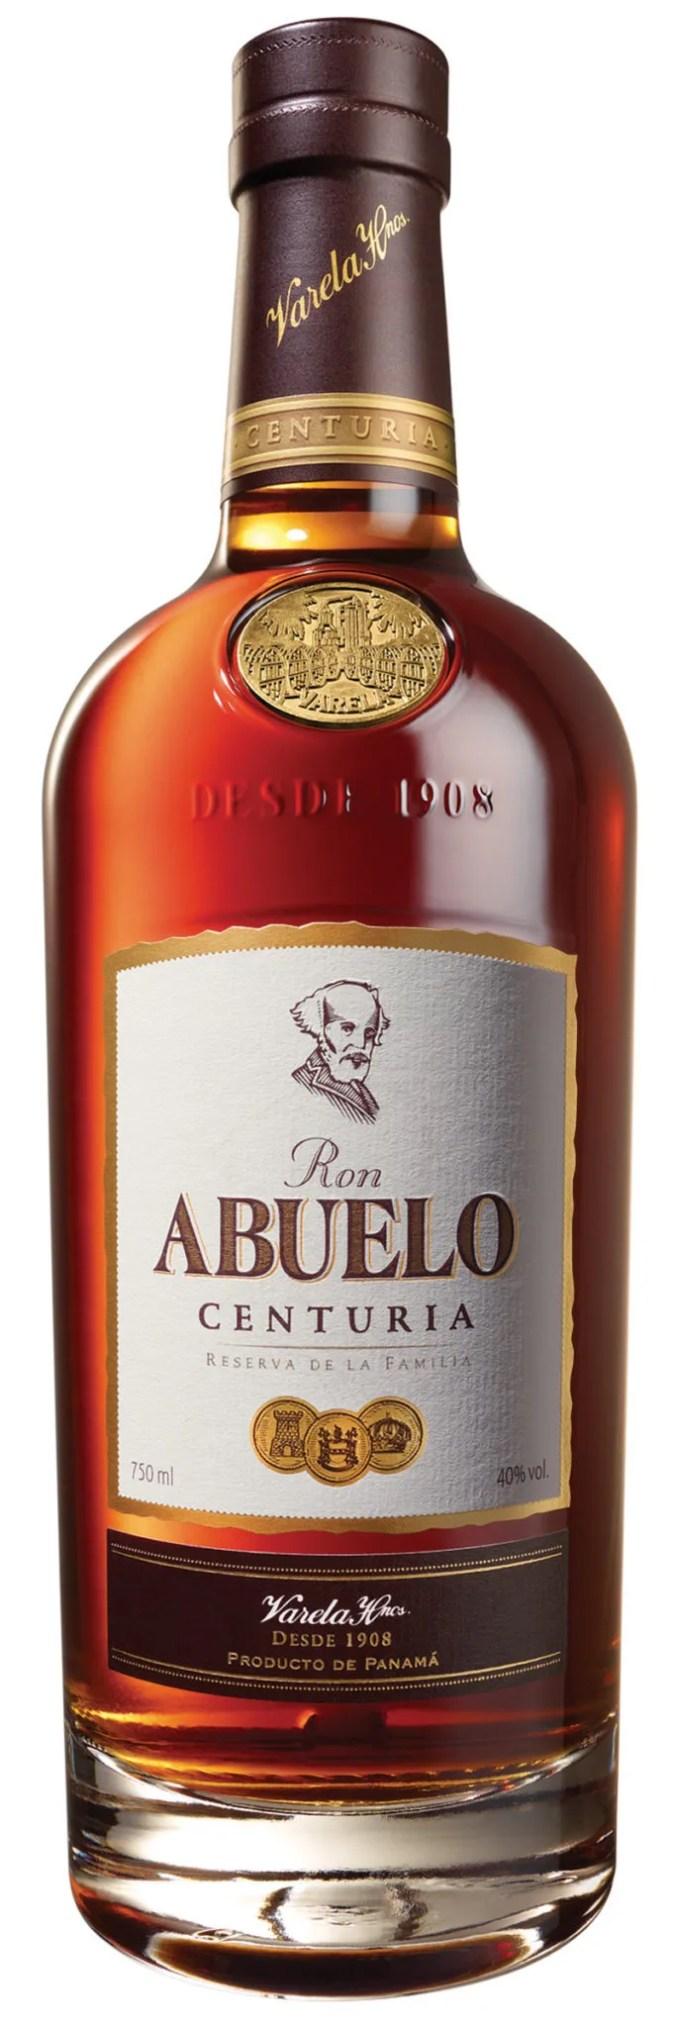 Abuelo Centuria Reserva de la Familia luxury aged rum from Panama